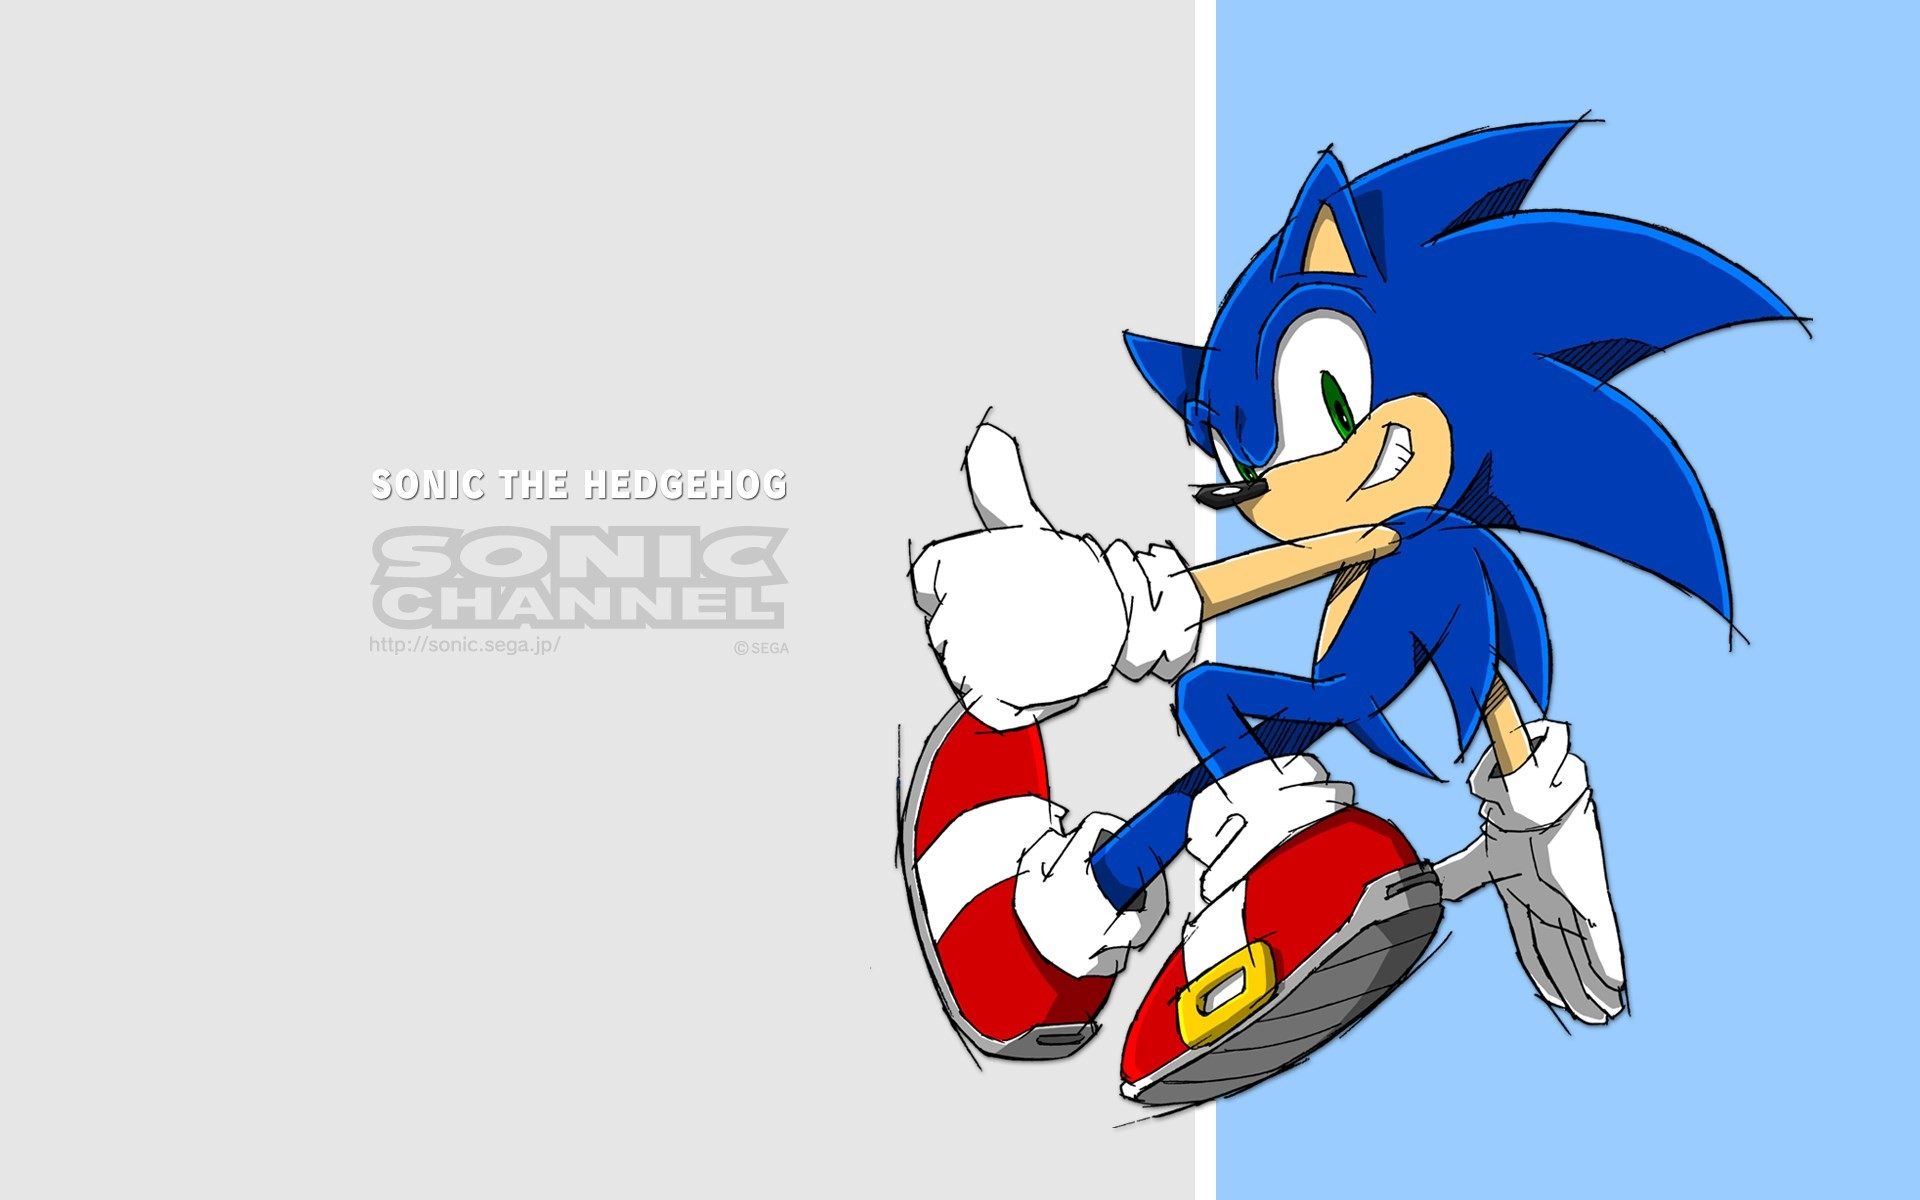 sonic the hedgehog wallpaper 1080p windows – sonic the hedgehog category